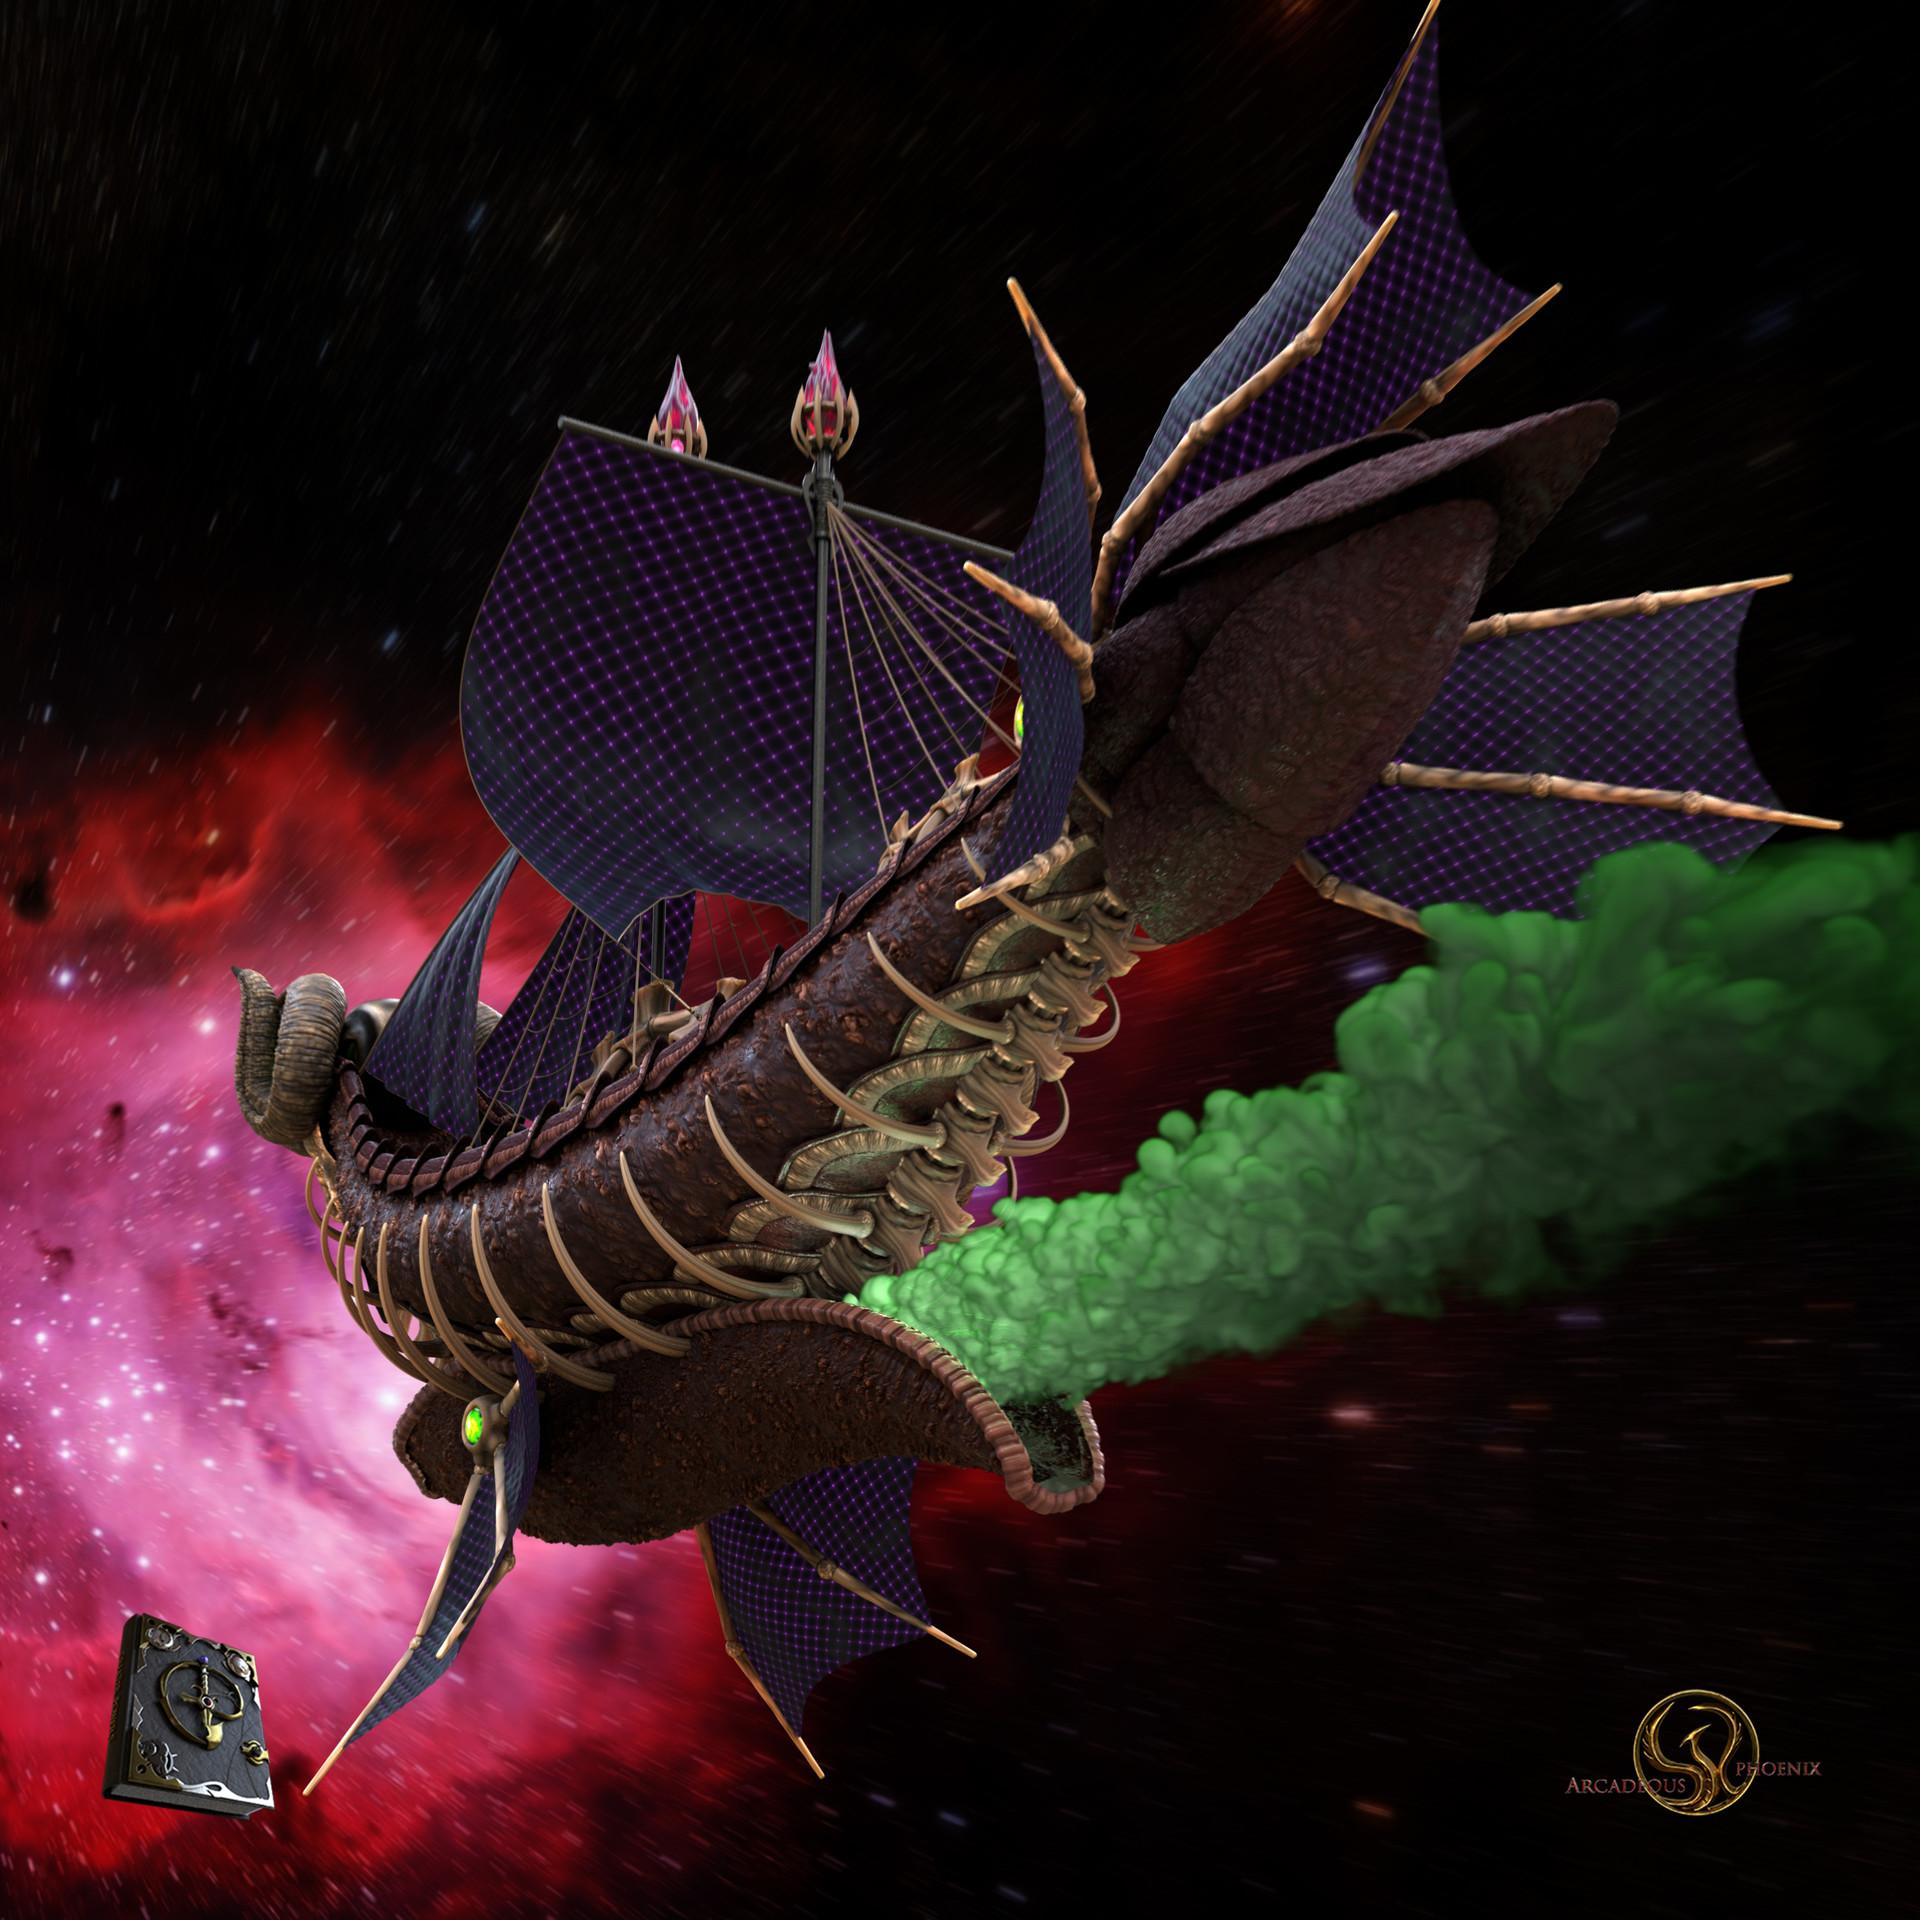 Arcadeous phoenix aries ship 0022